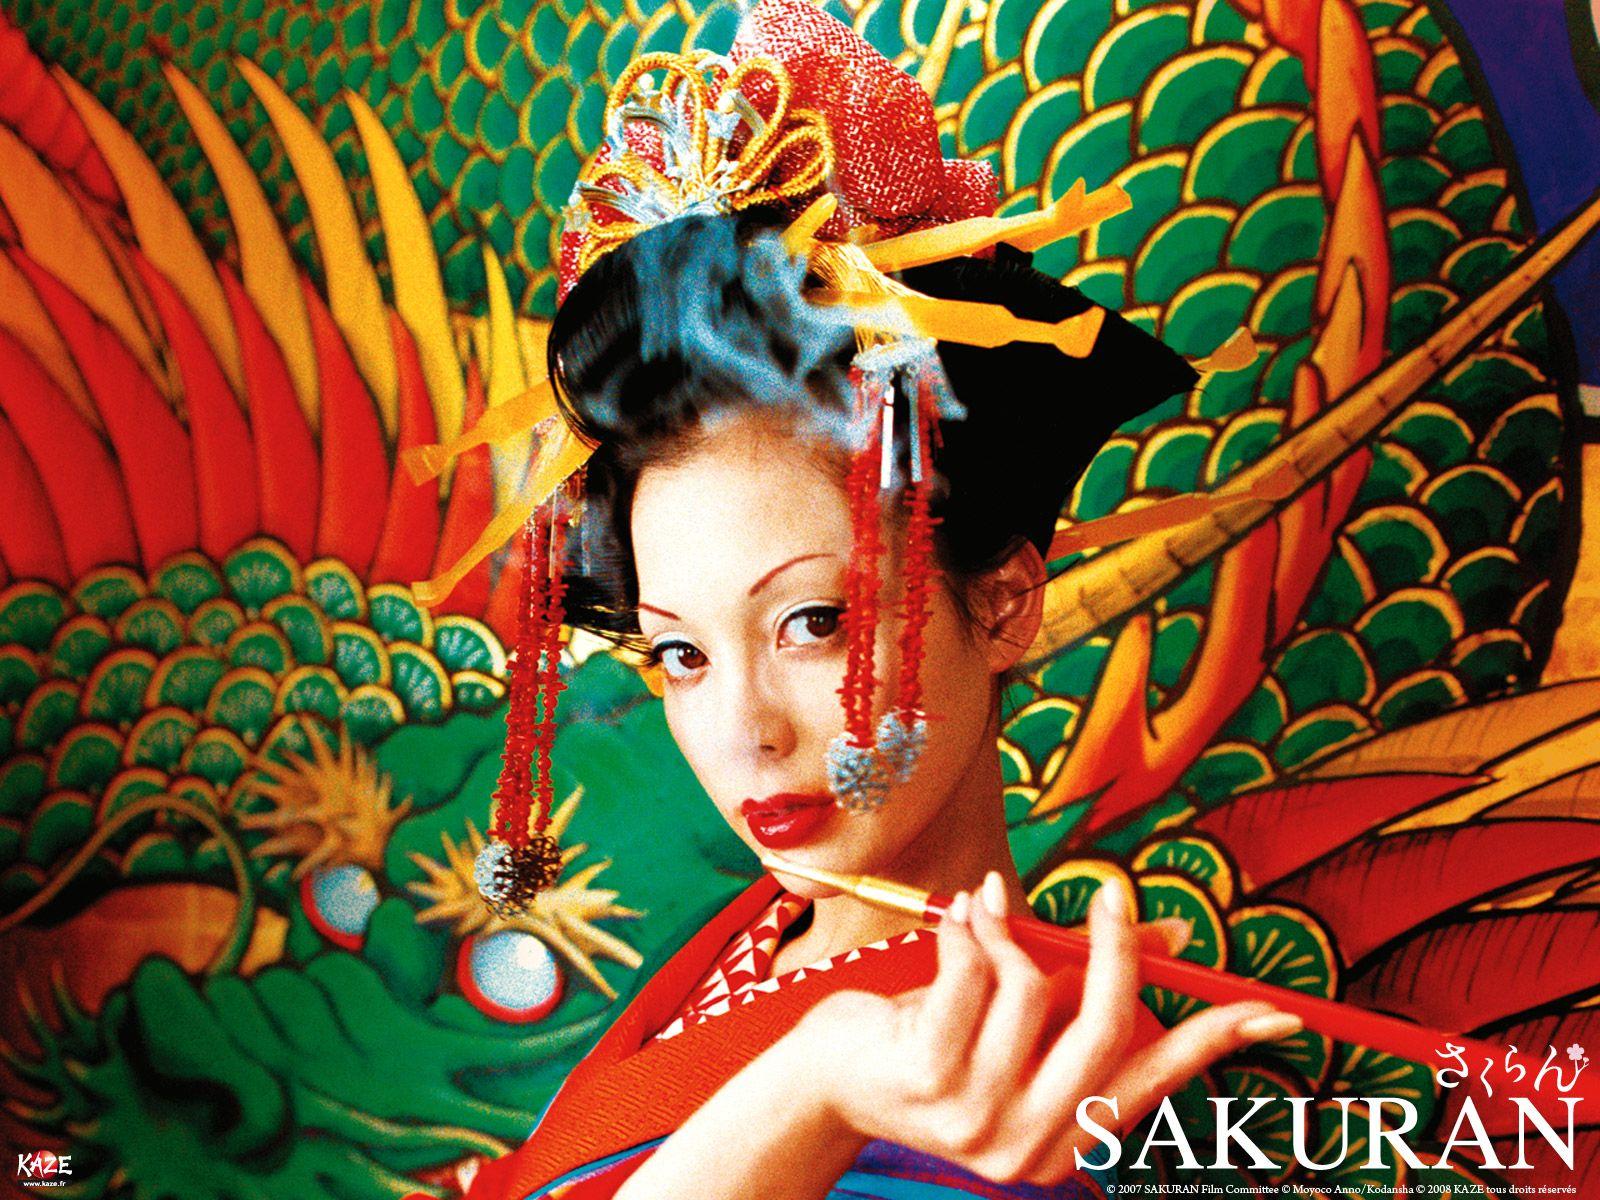 Sakuran  - Japanese movie based on a manga by Moyoco Anno